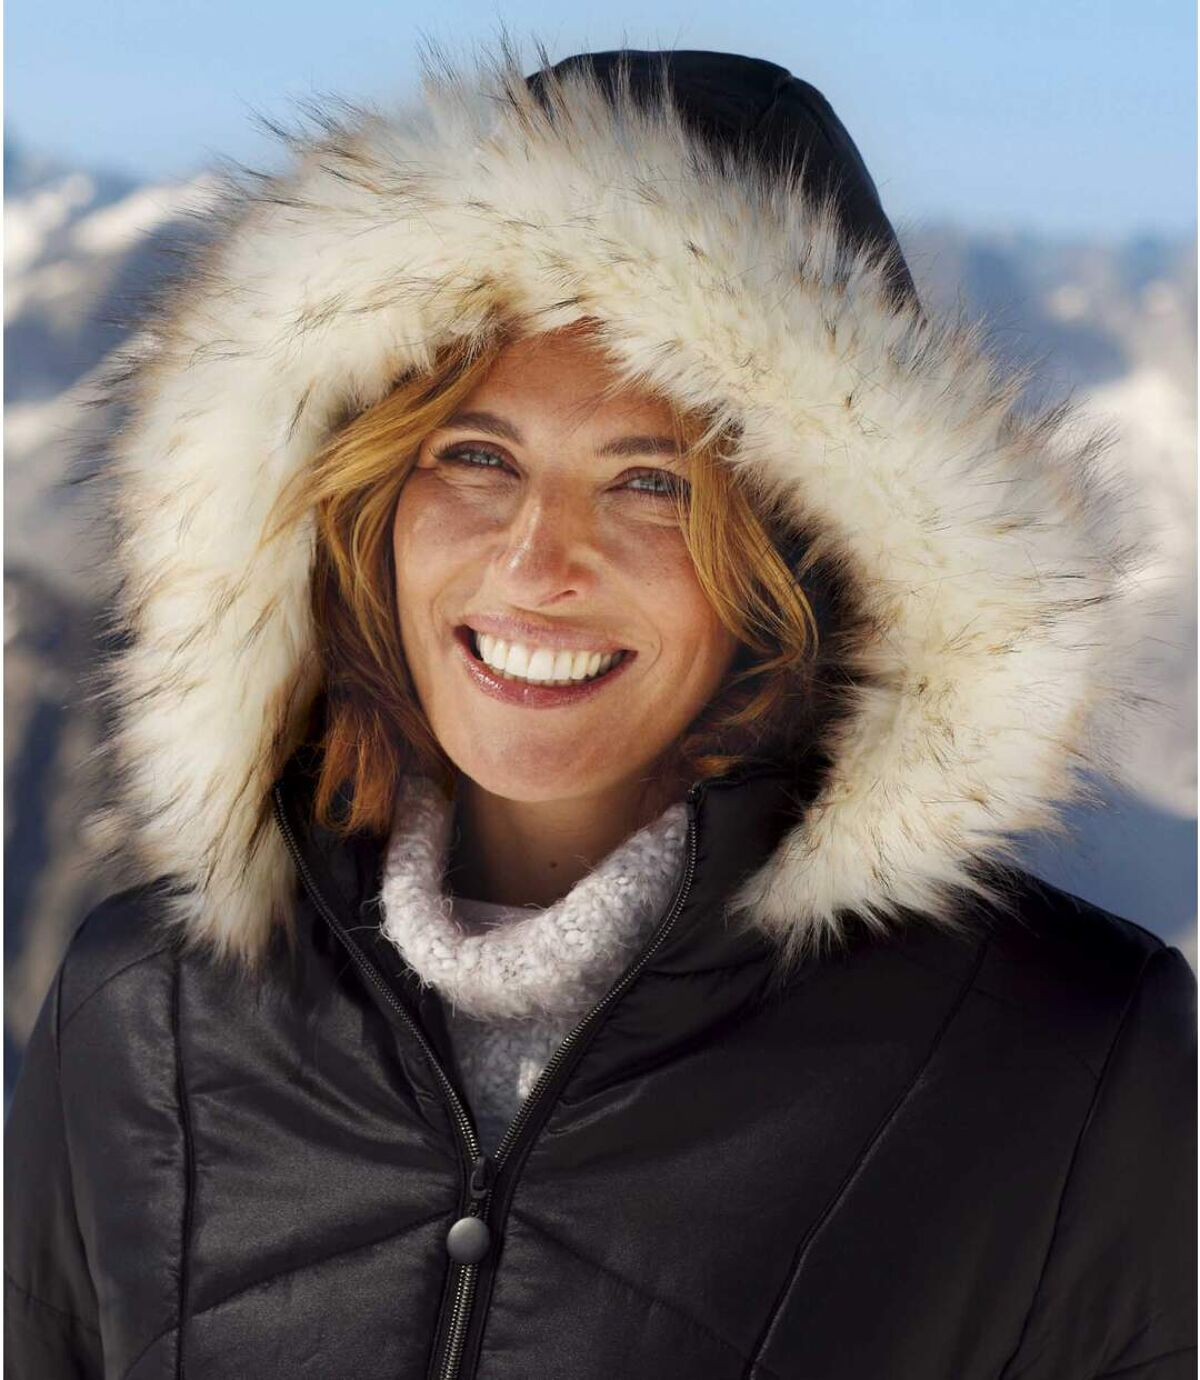 Wattierte Jacke Große Kälte mit Webpelz-Kapuze Atlas For Men